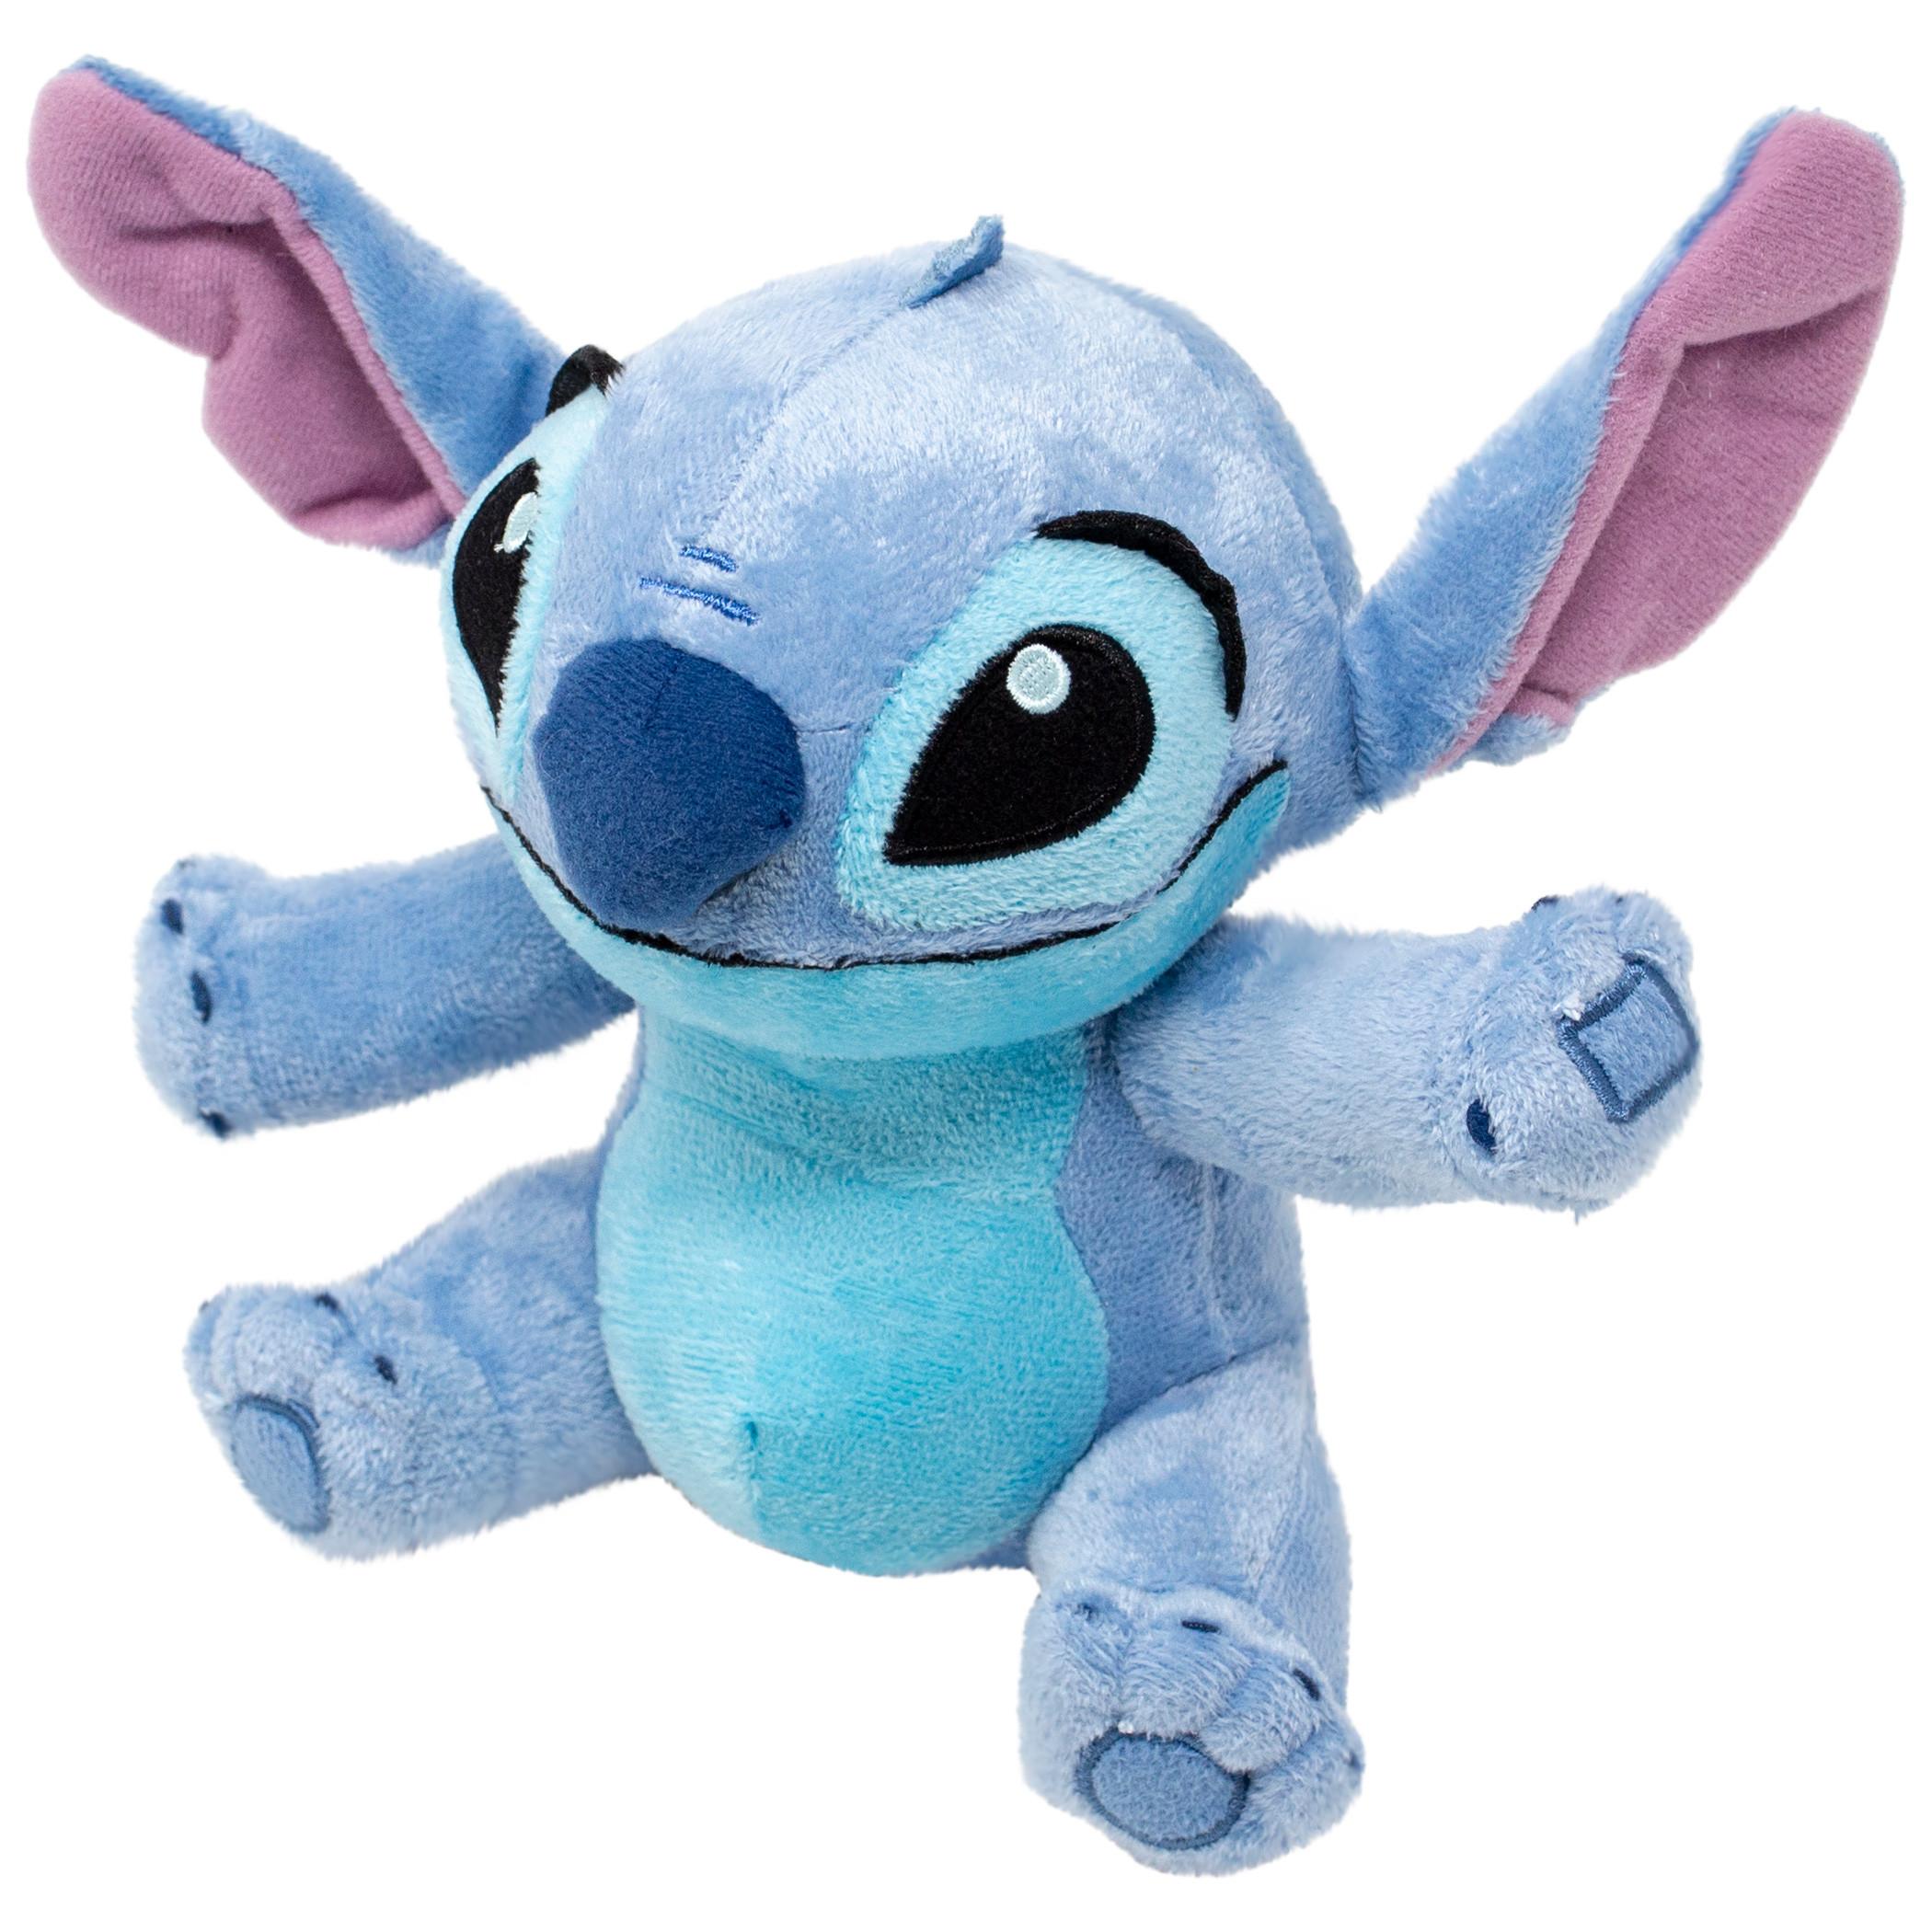 Disney Lilo and Stitch Plush Doll